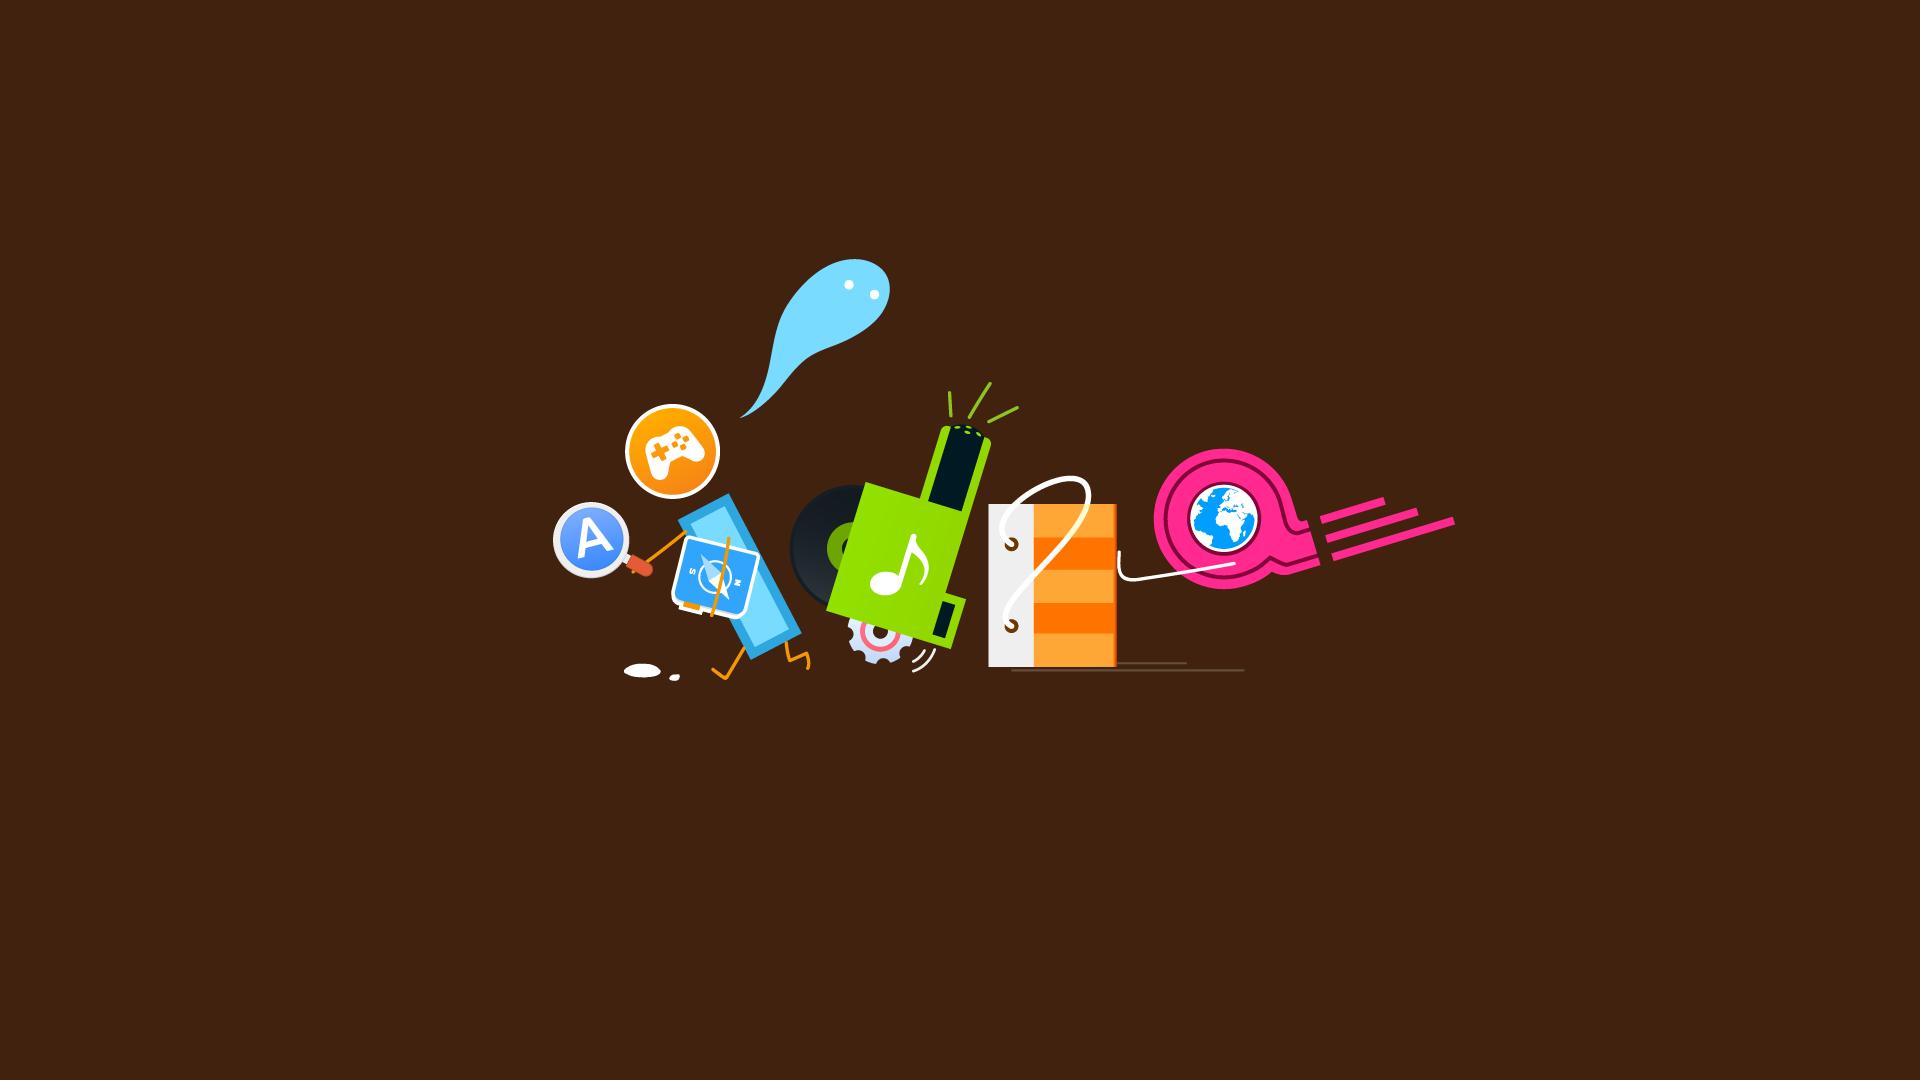 [Share Wallpaper] Say Your Ideas : Deepin Technology Blog